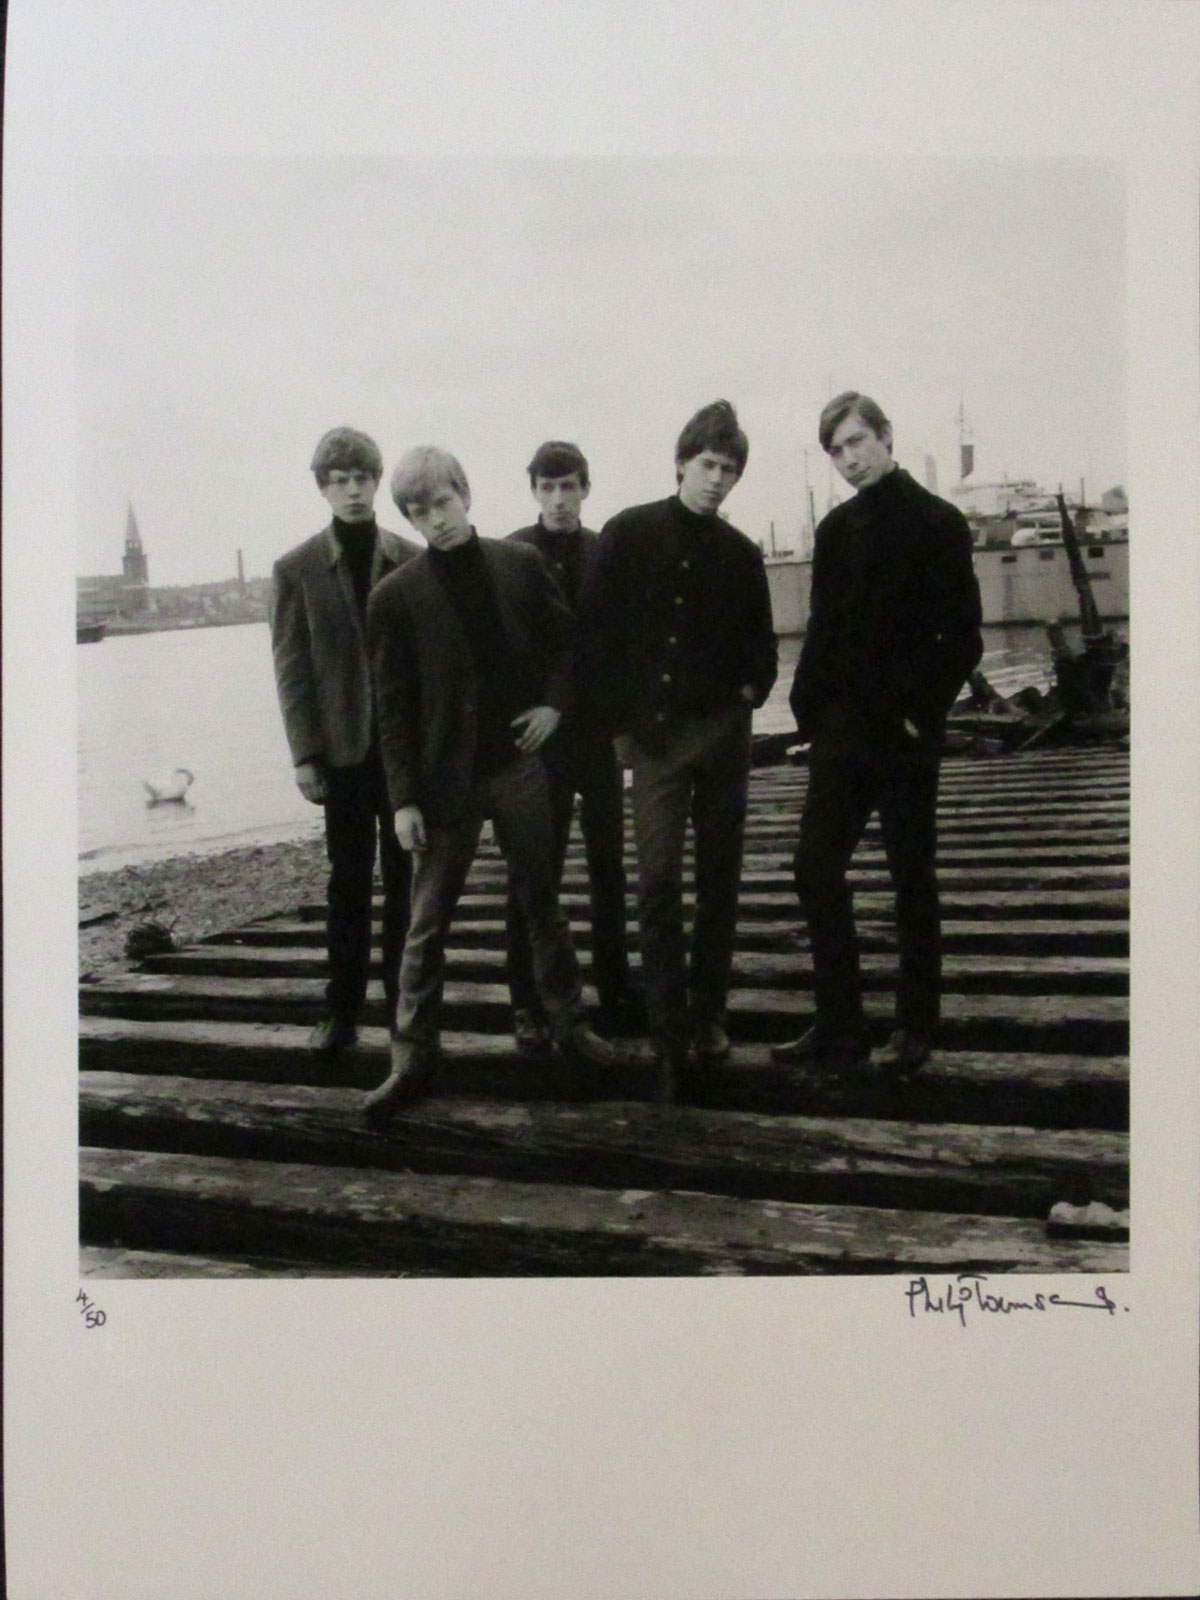 Rolling Stones - On The Docks - IFF0006